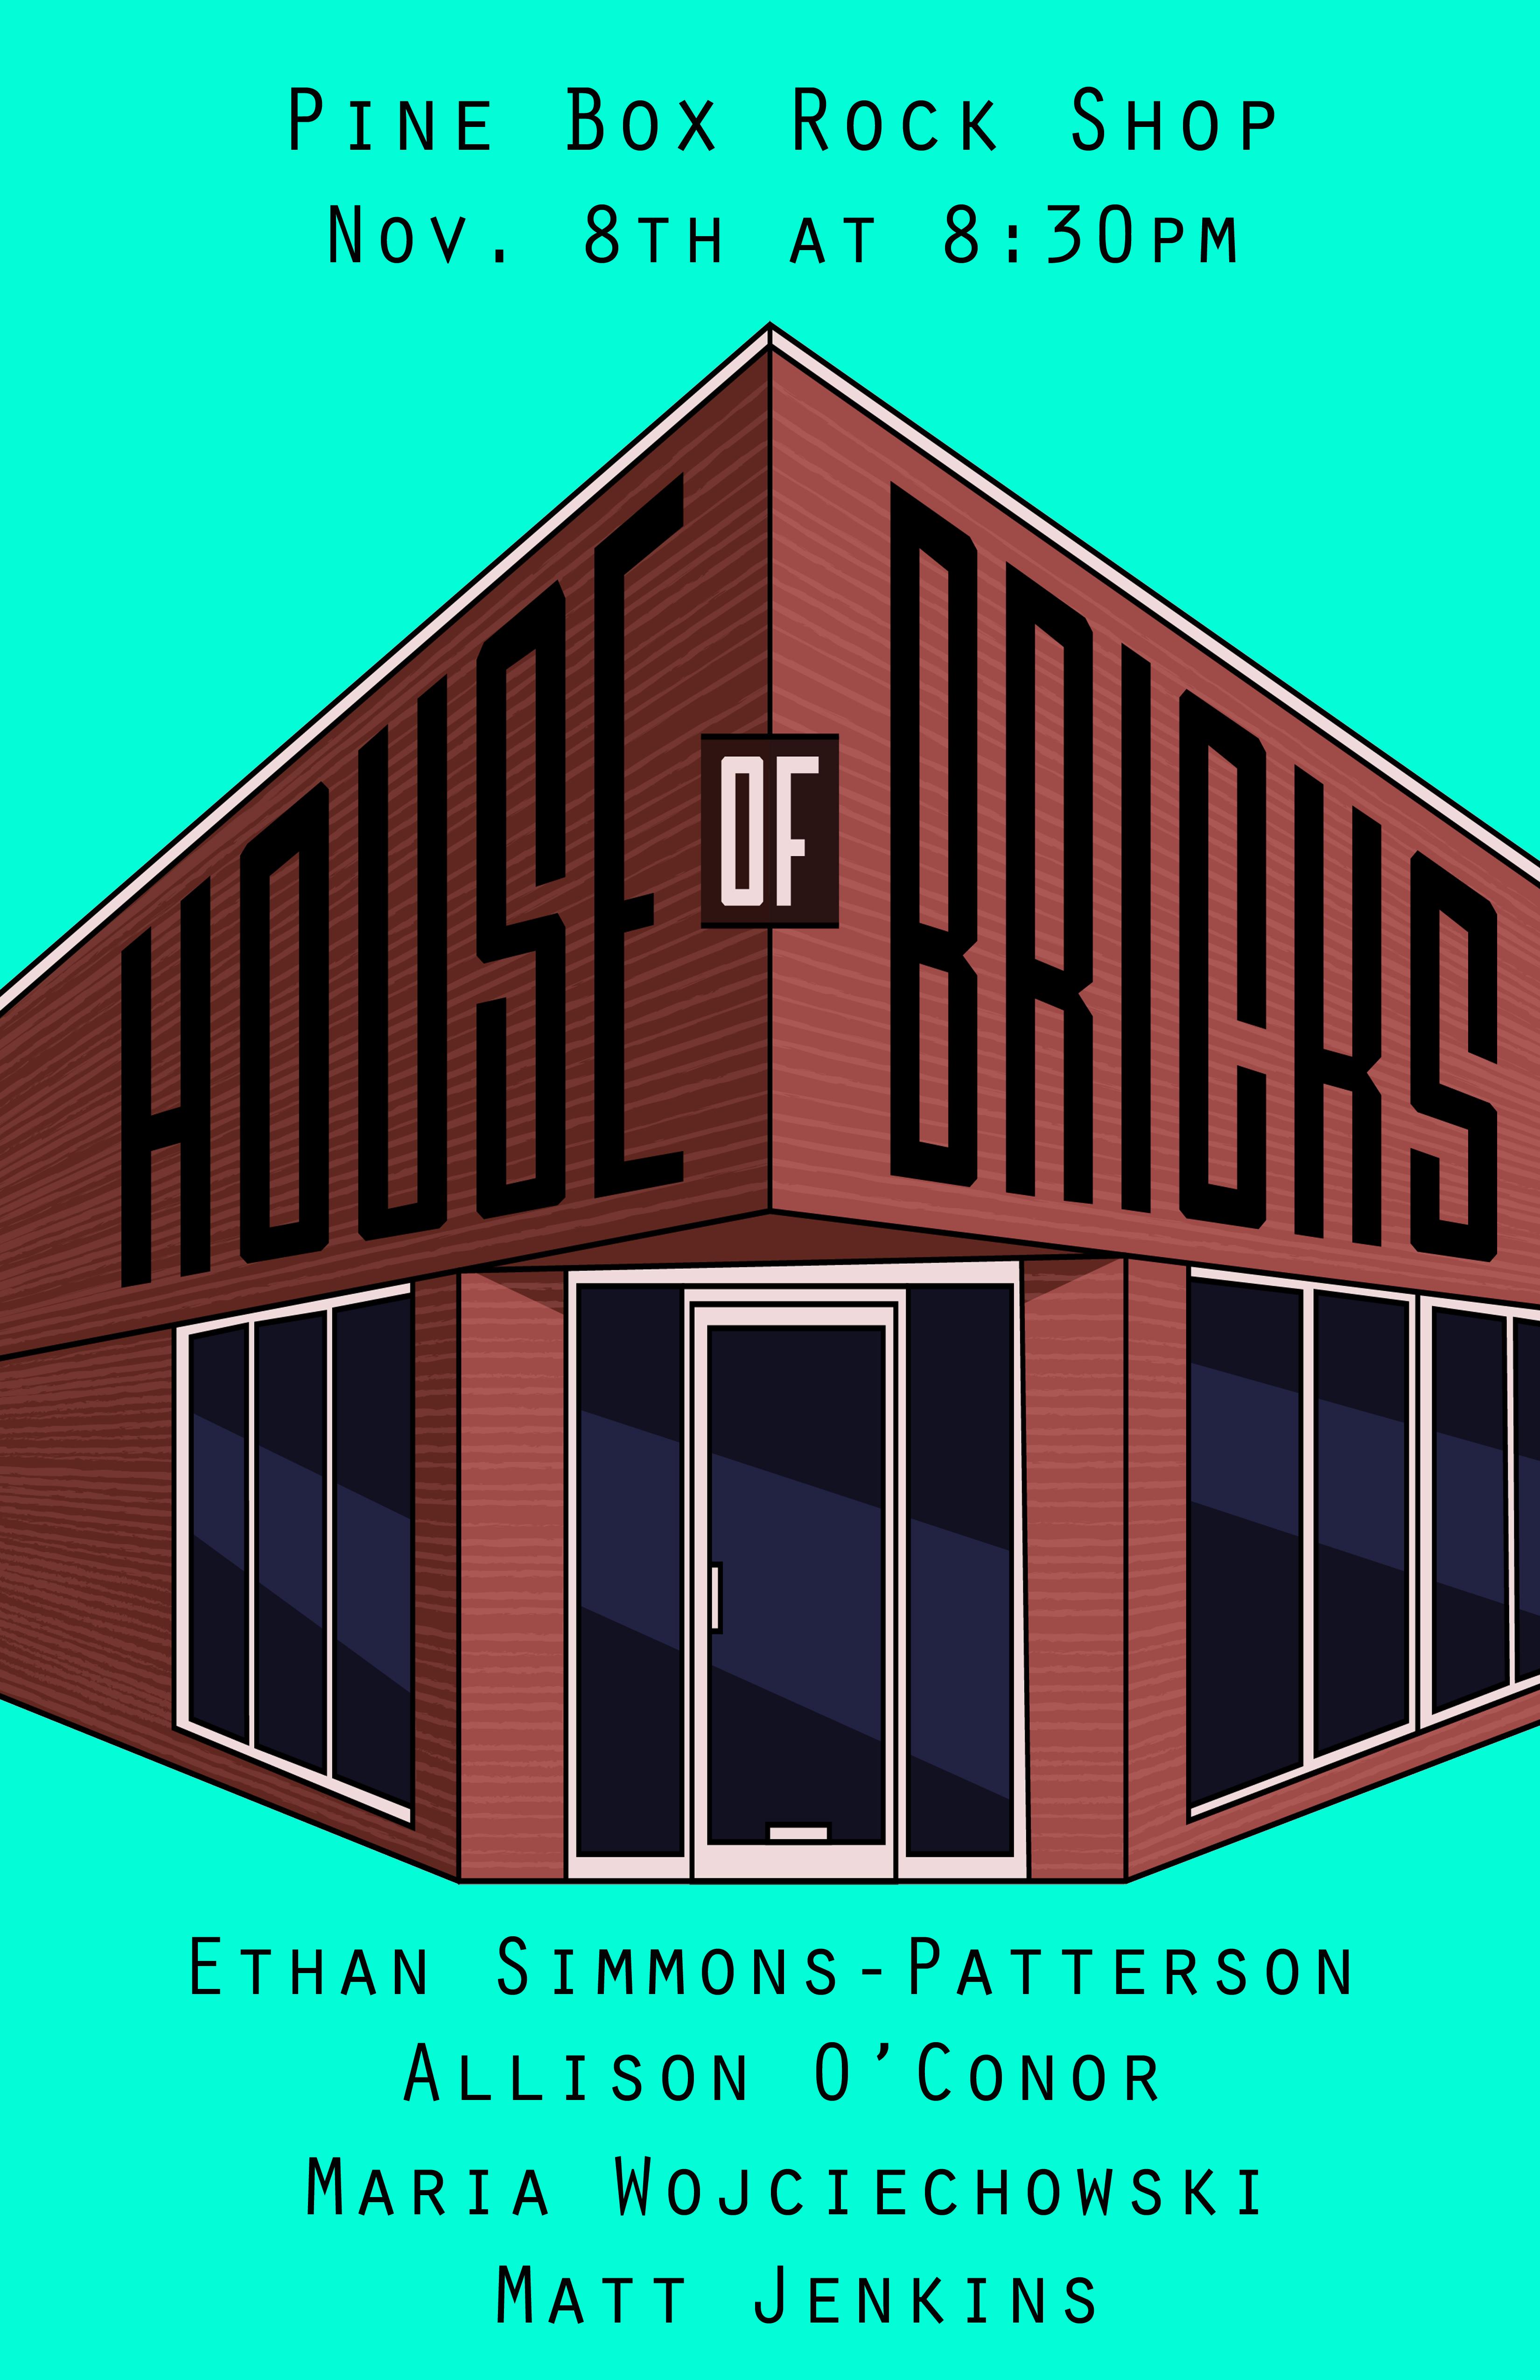 house of bricks poster